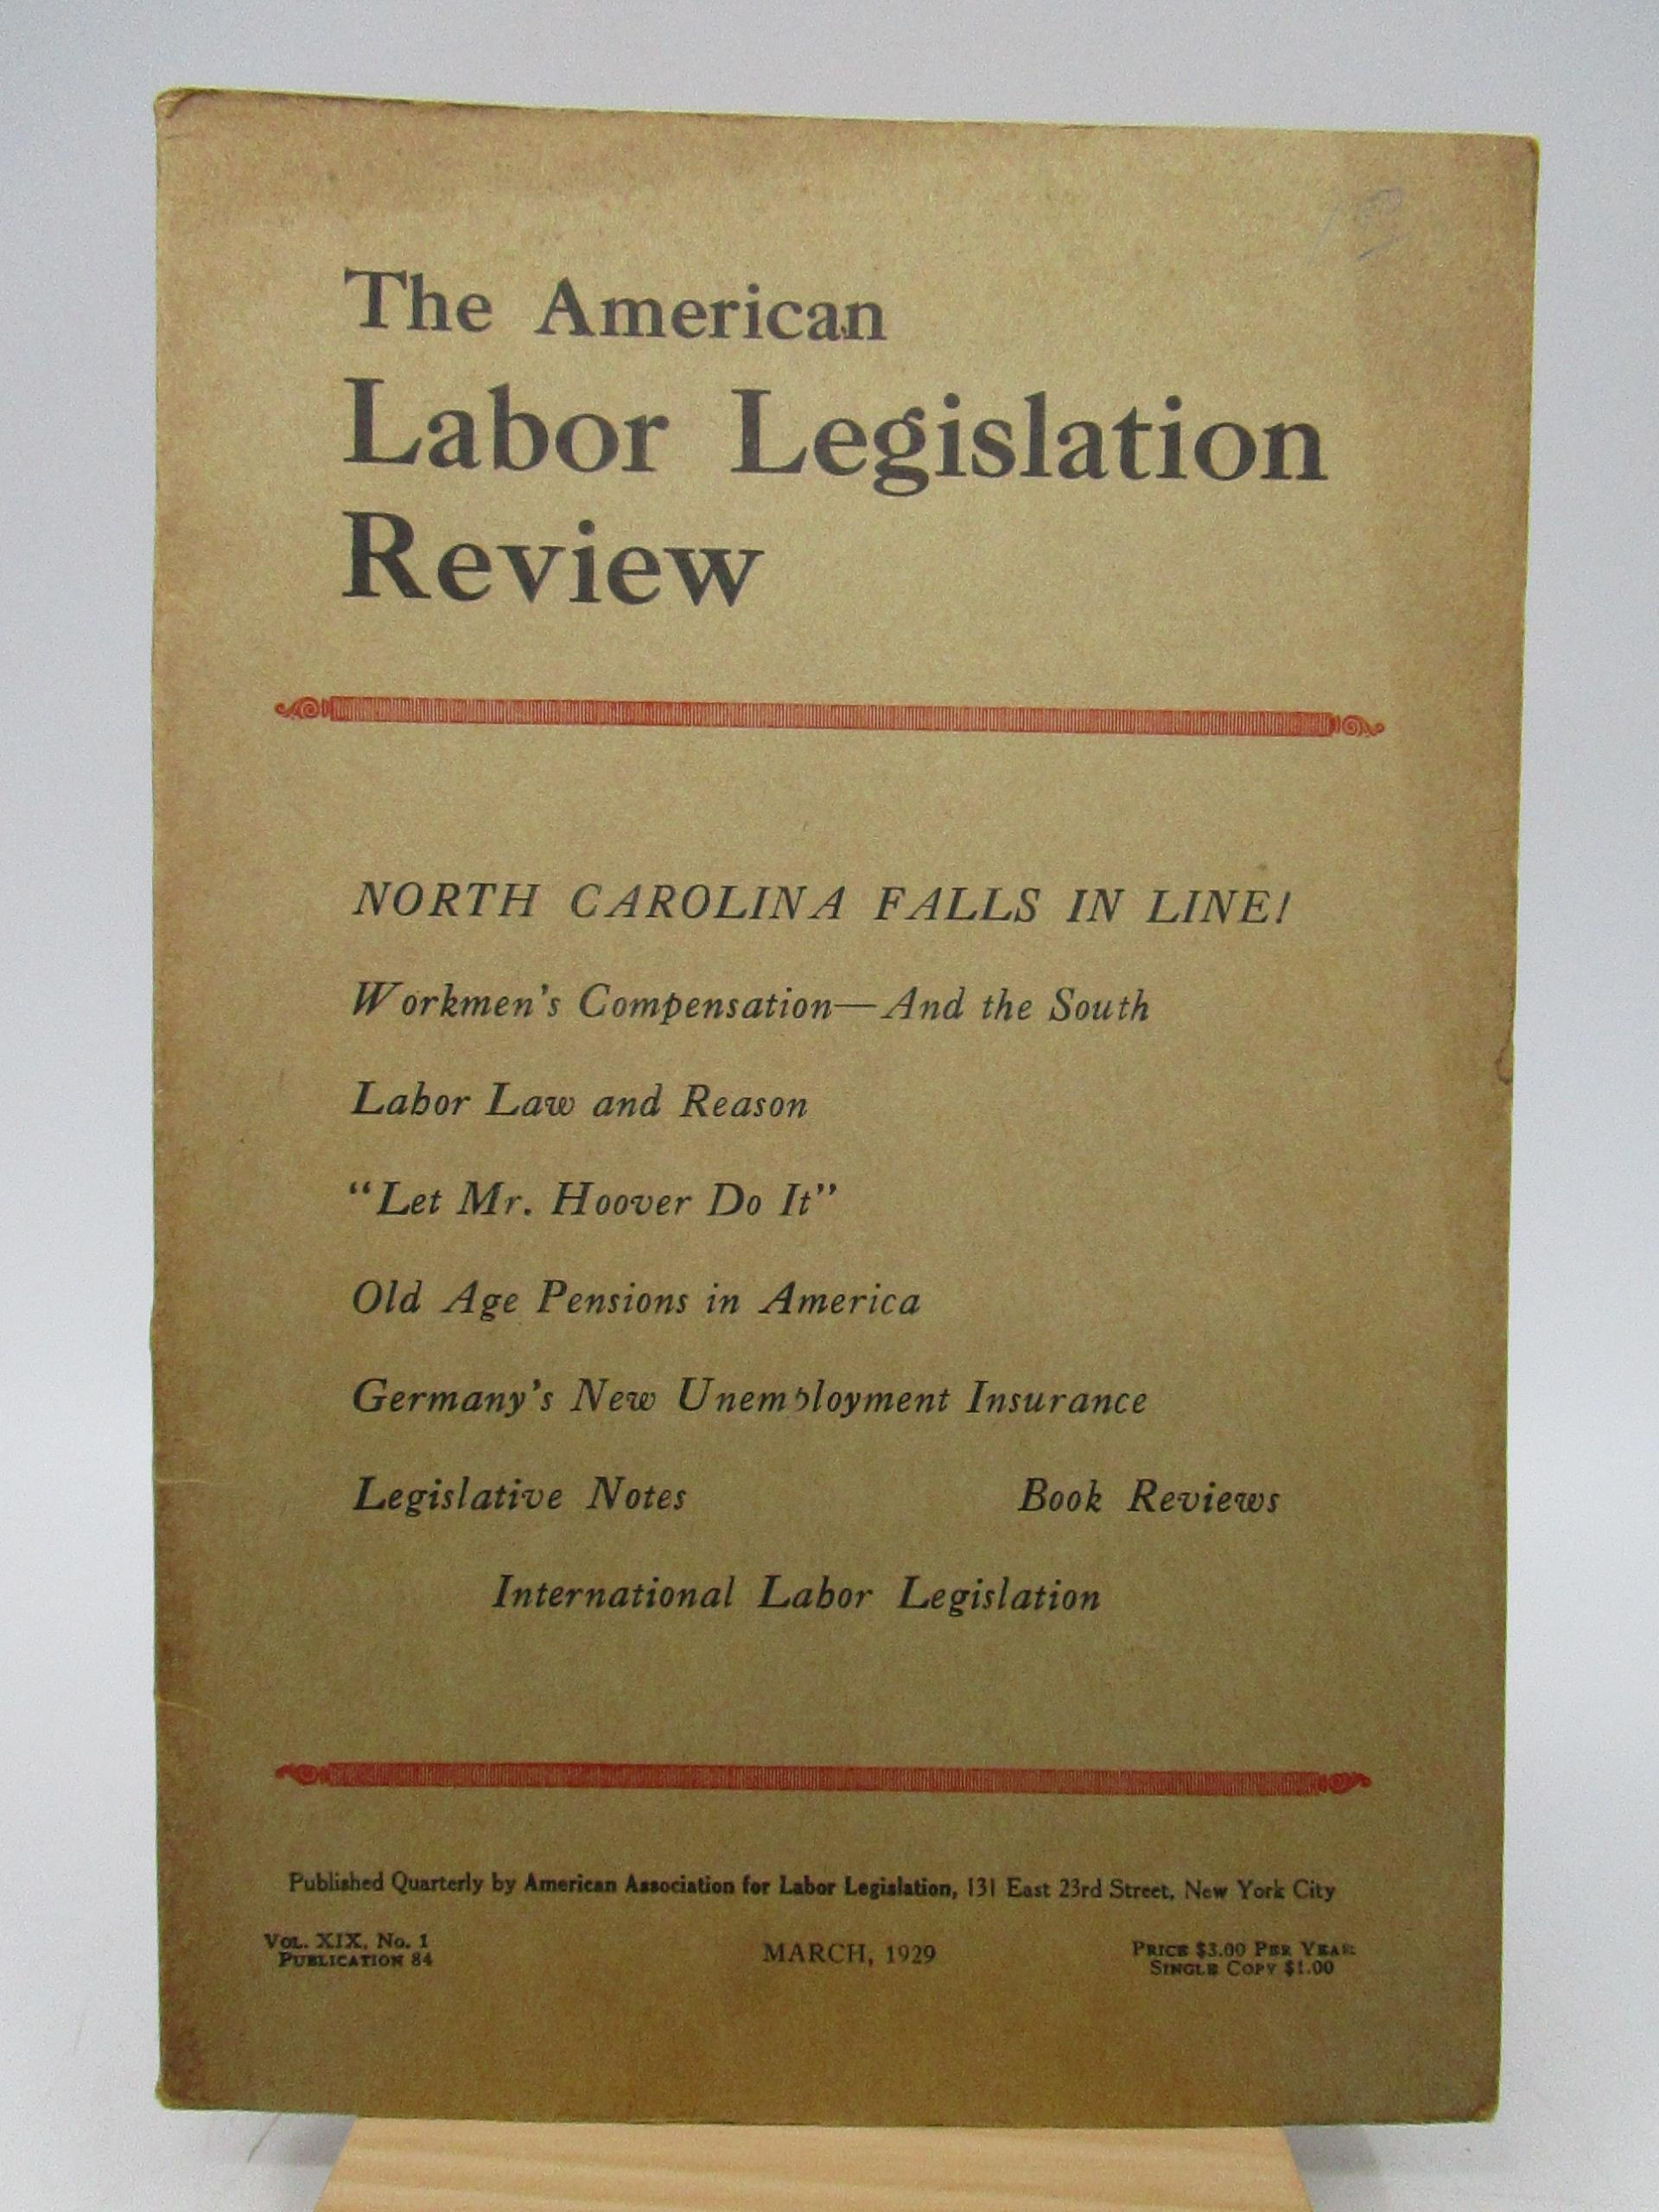 Image for The American Labor Legislation Review Vol. XIX, No. 1